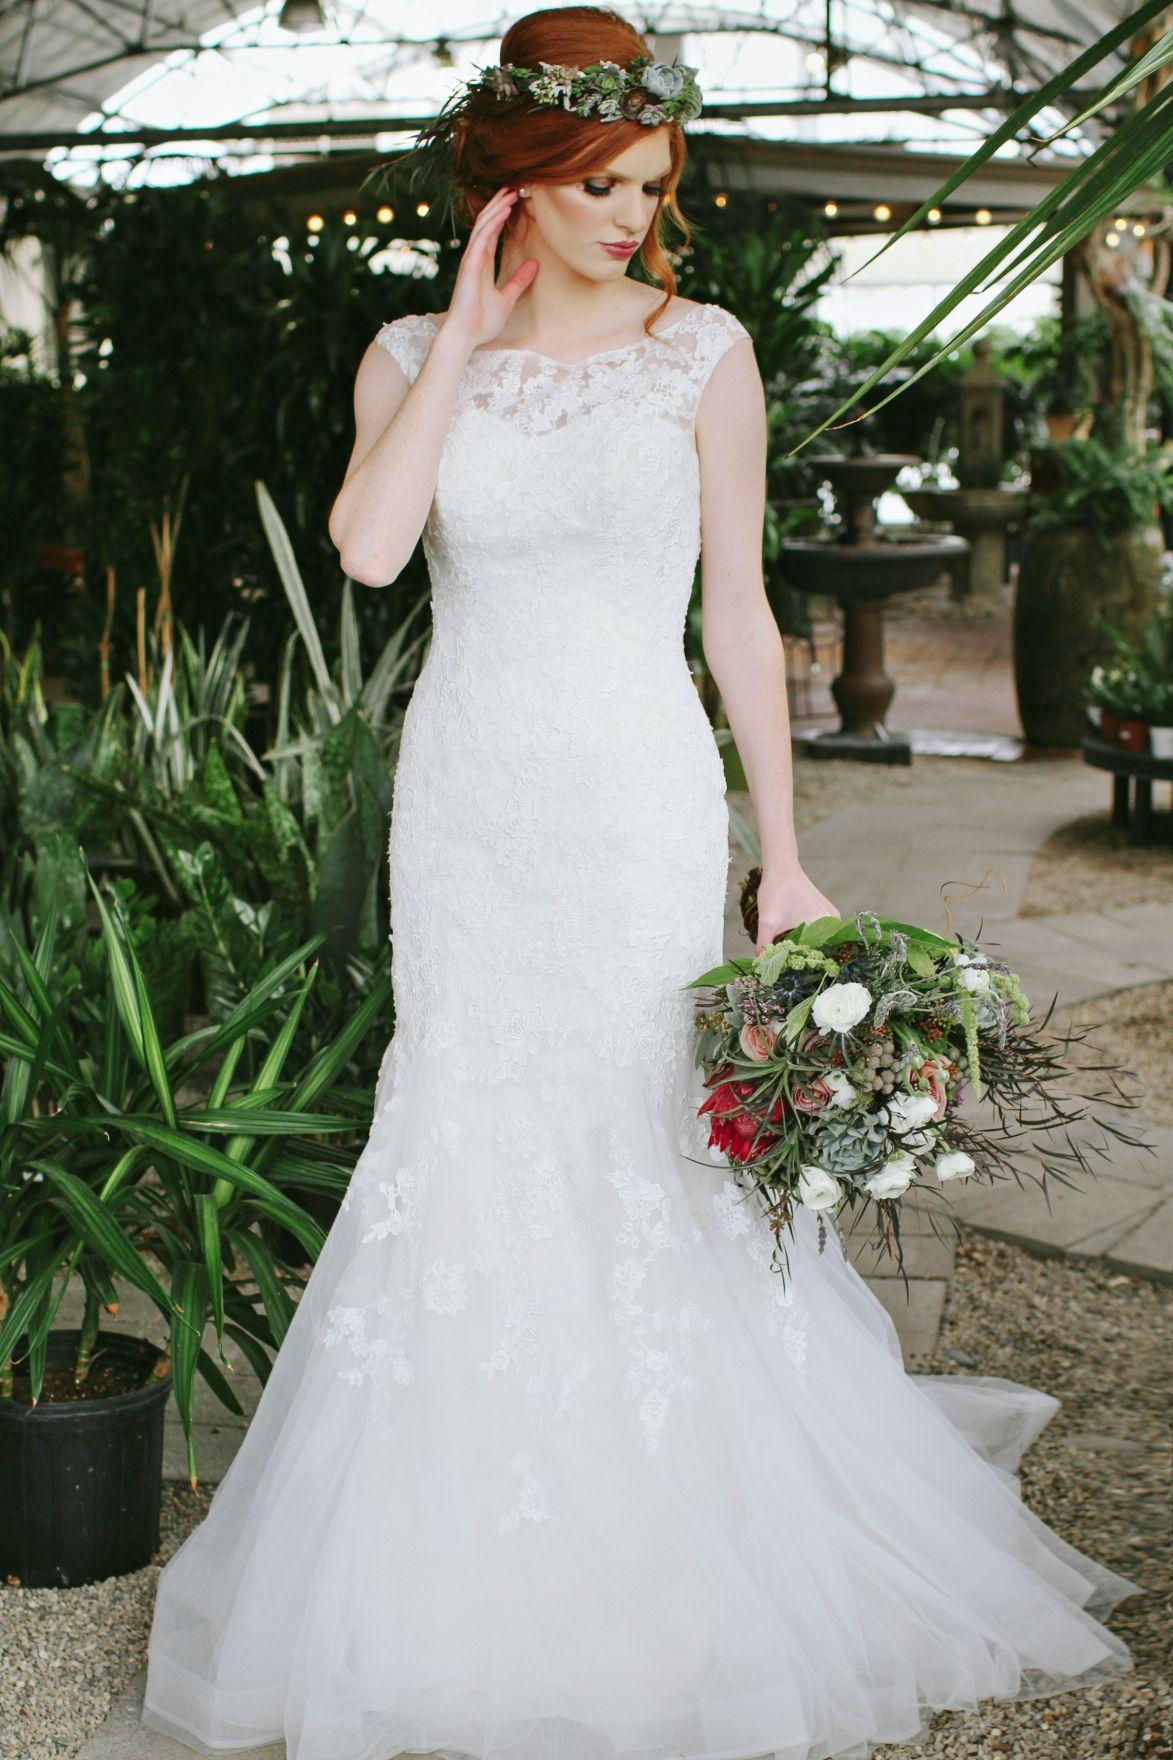 100+ Utah Wedding Dress Rental - Dresses for Wedding Party Check ...